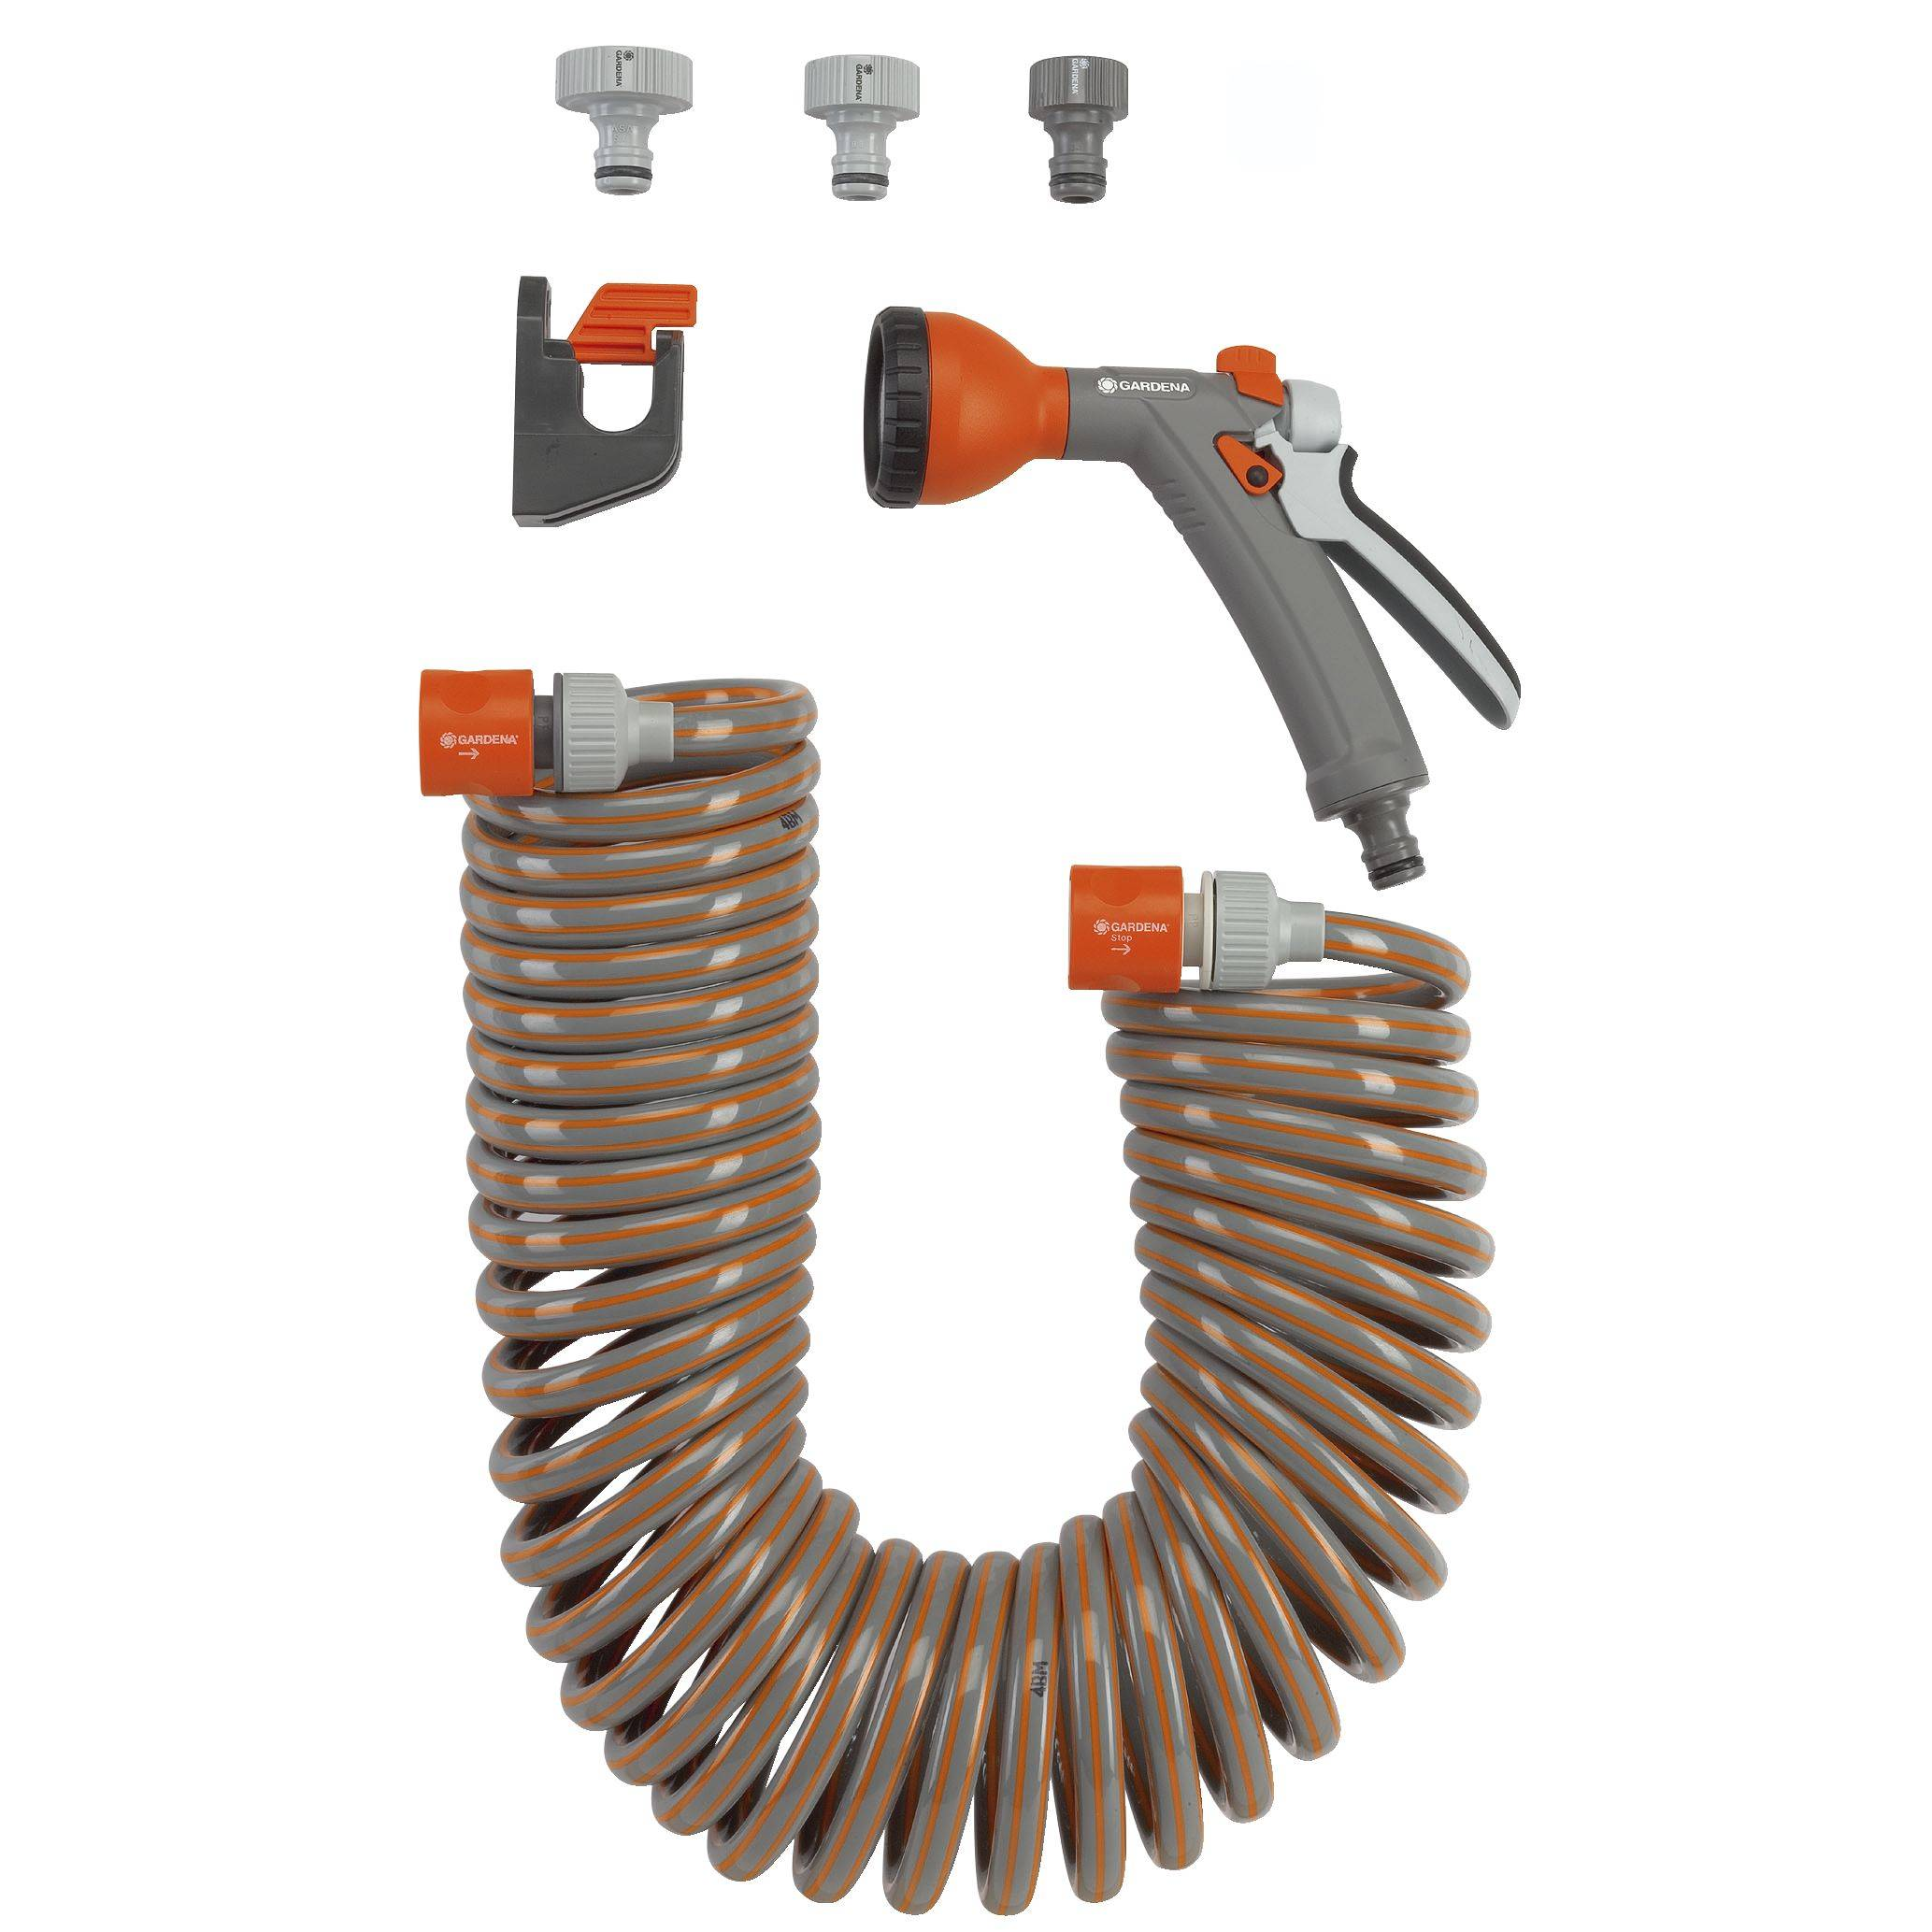 Vaak GARDENA 4647-20 Spiraal-tuinslang set 6.1 mm 1/4 inch 10 m Grijs QJ16